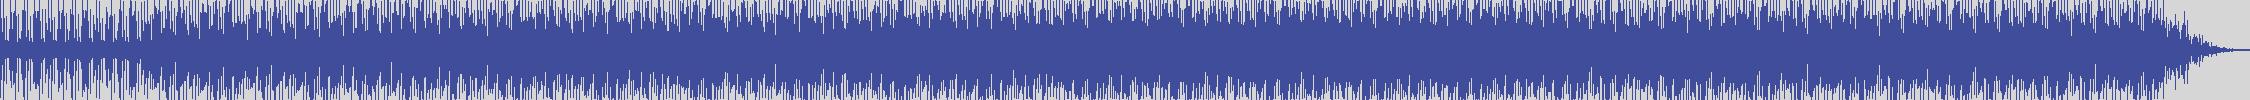 just_digital_records [JS1224] Nikon - Midnight Feelings [Original Mix] audio wave form